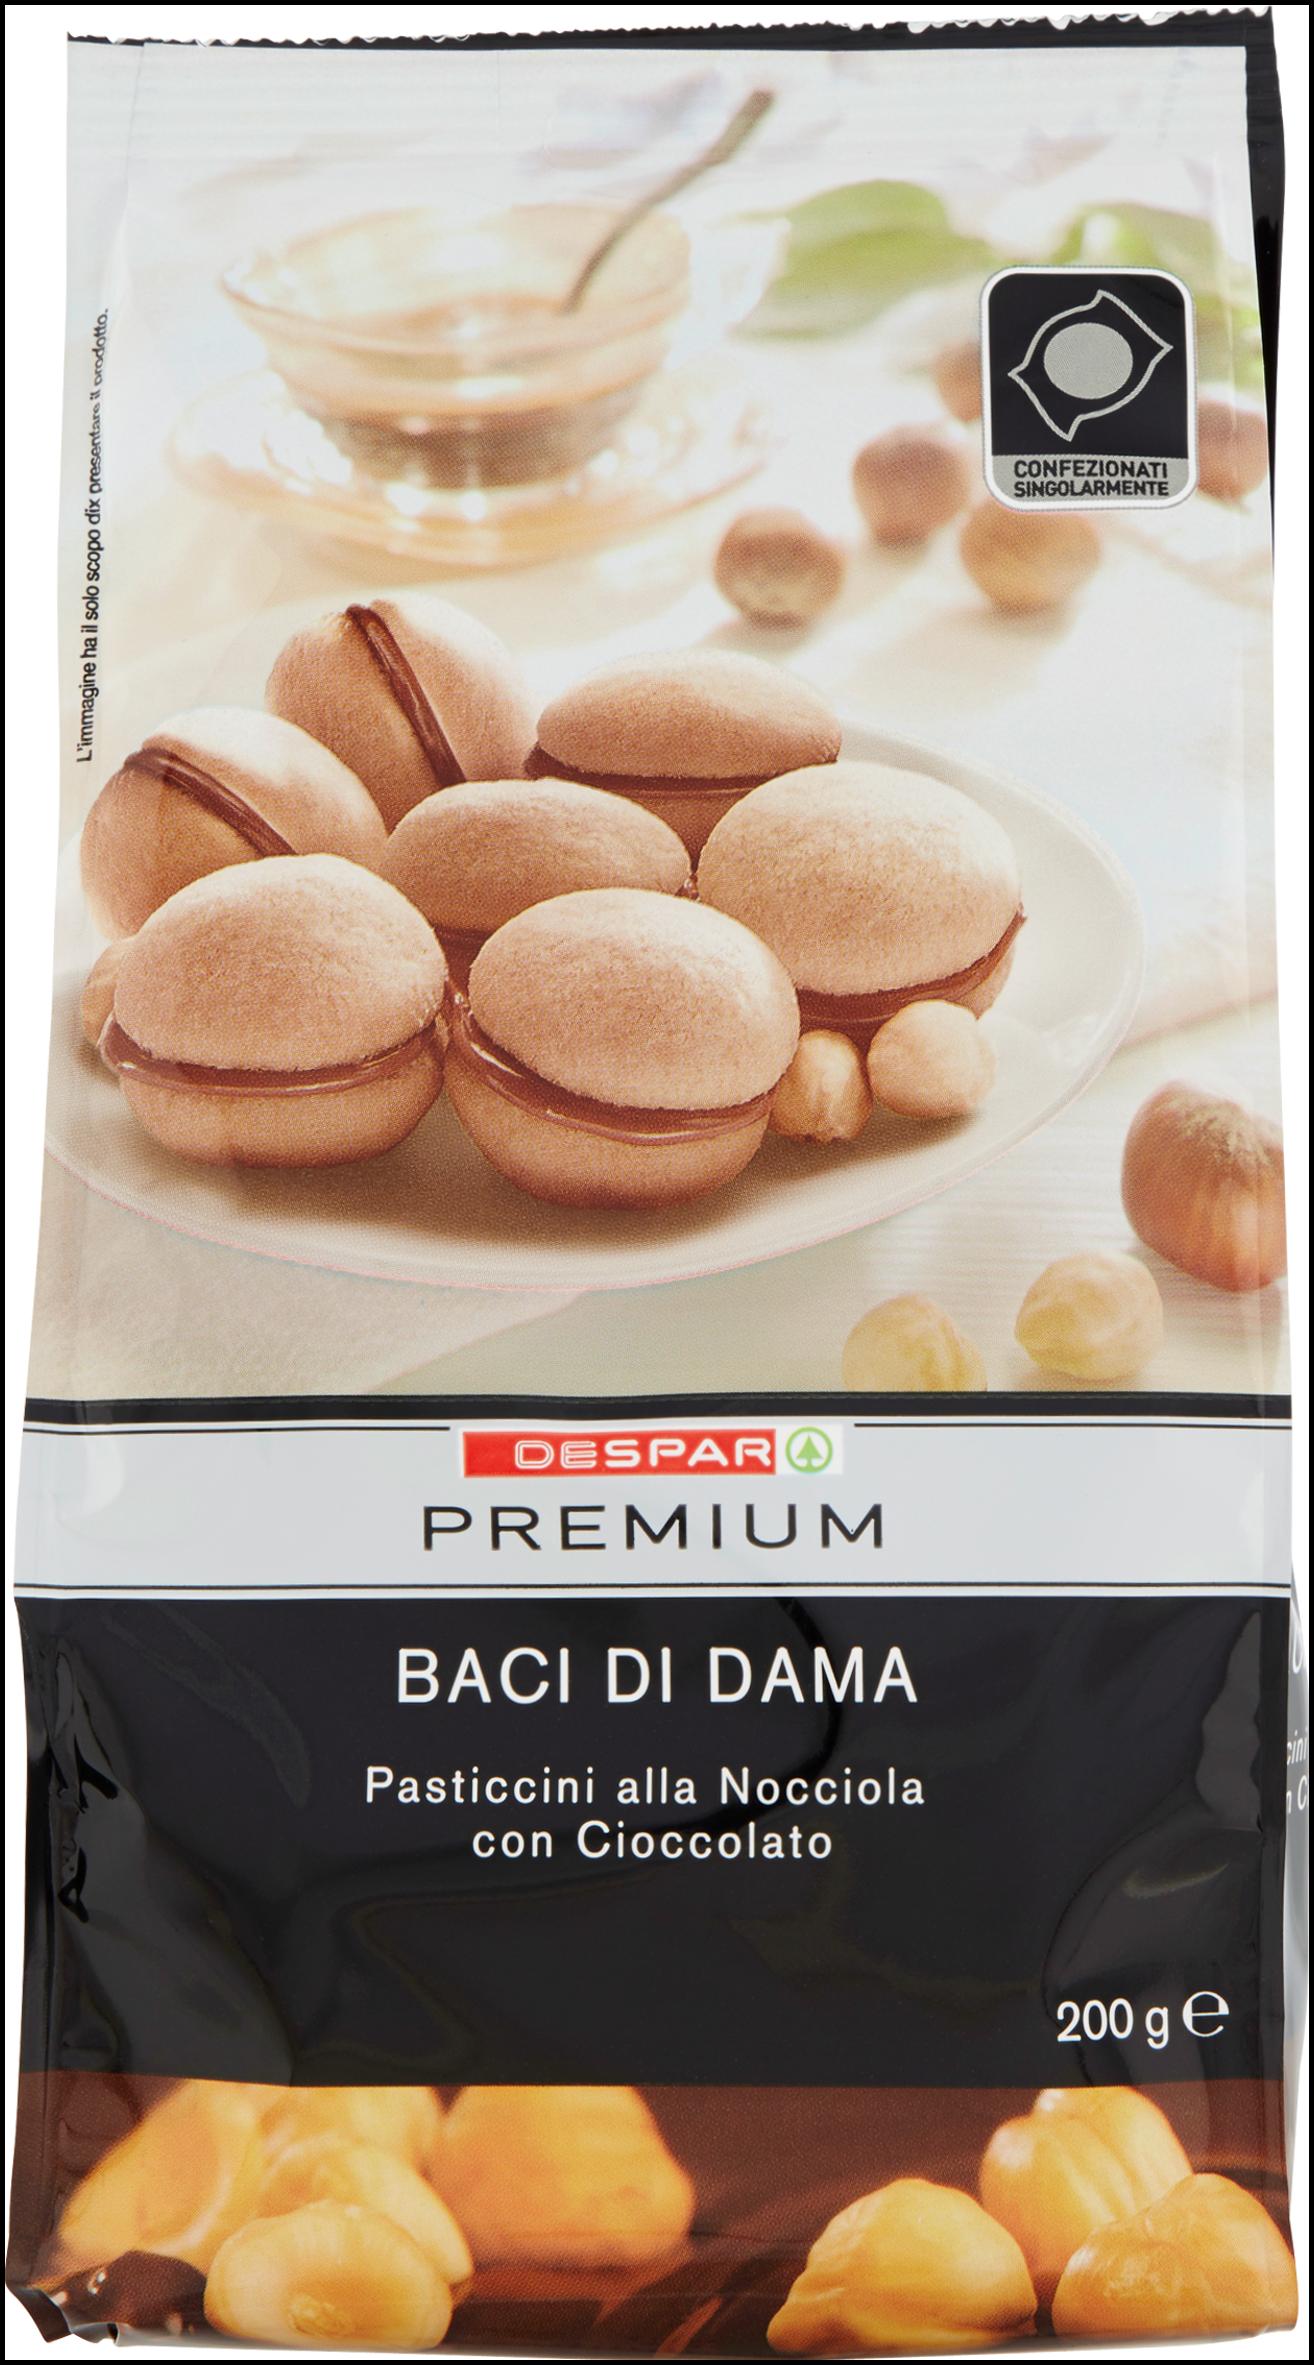 BACI DI DAMA PREMIUM 200G